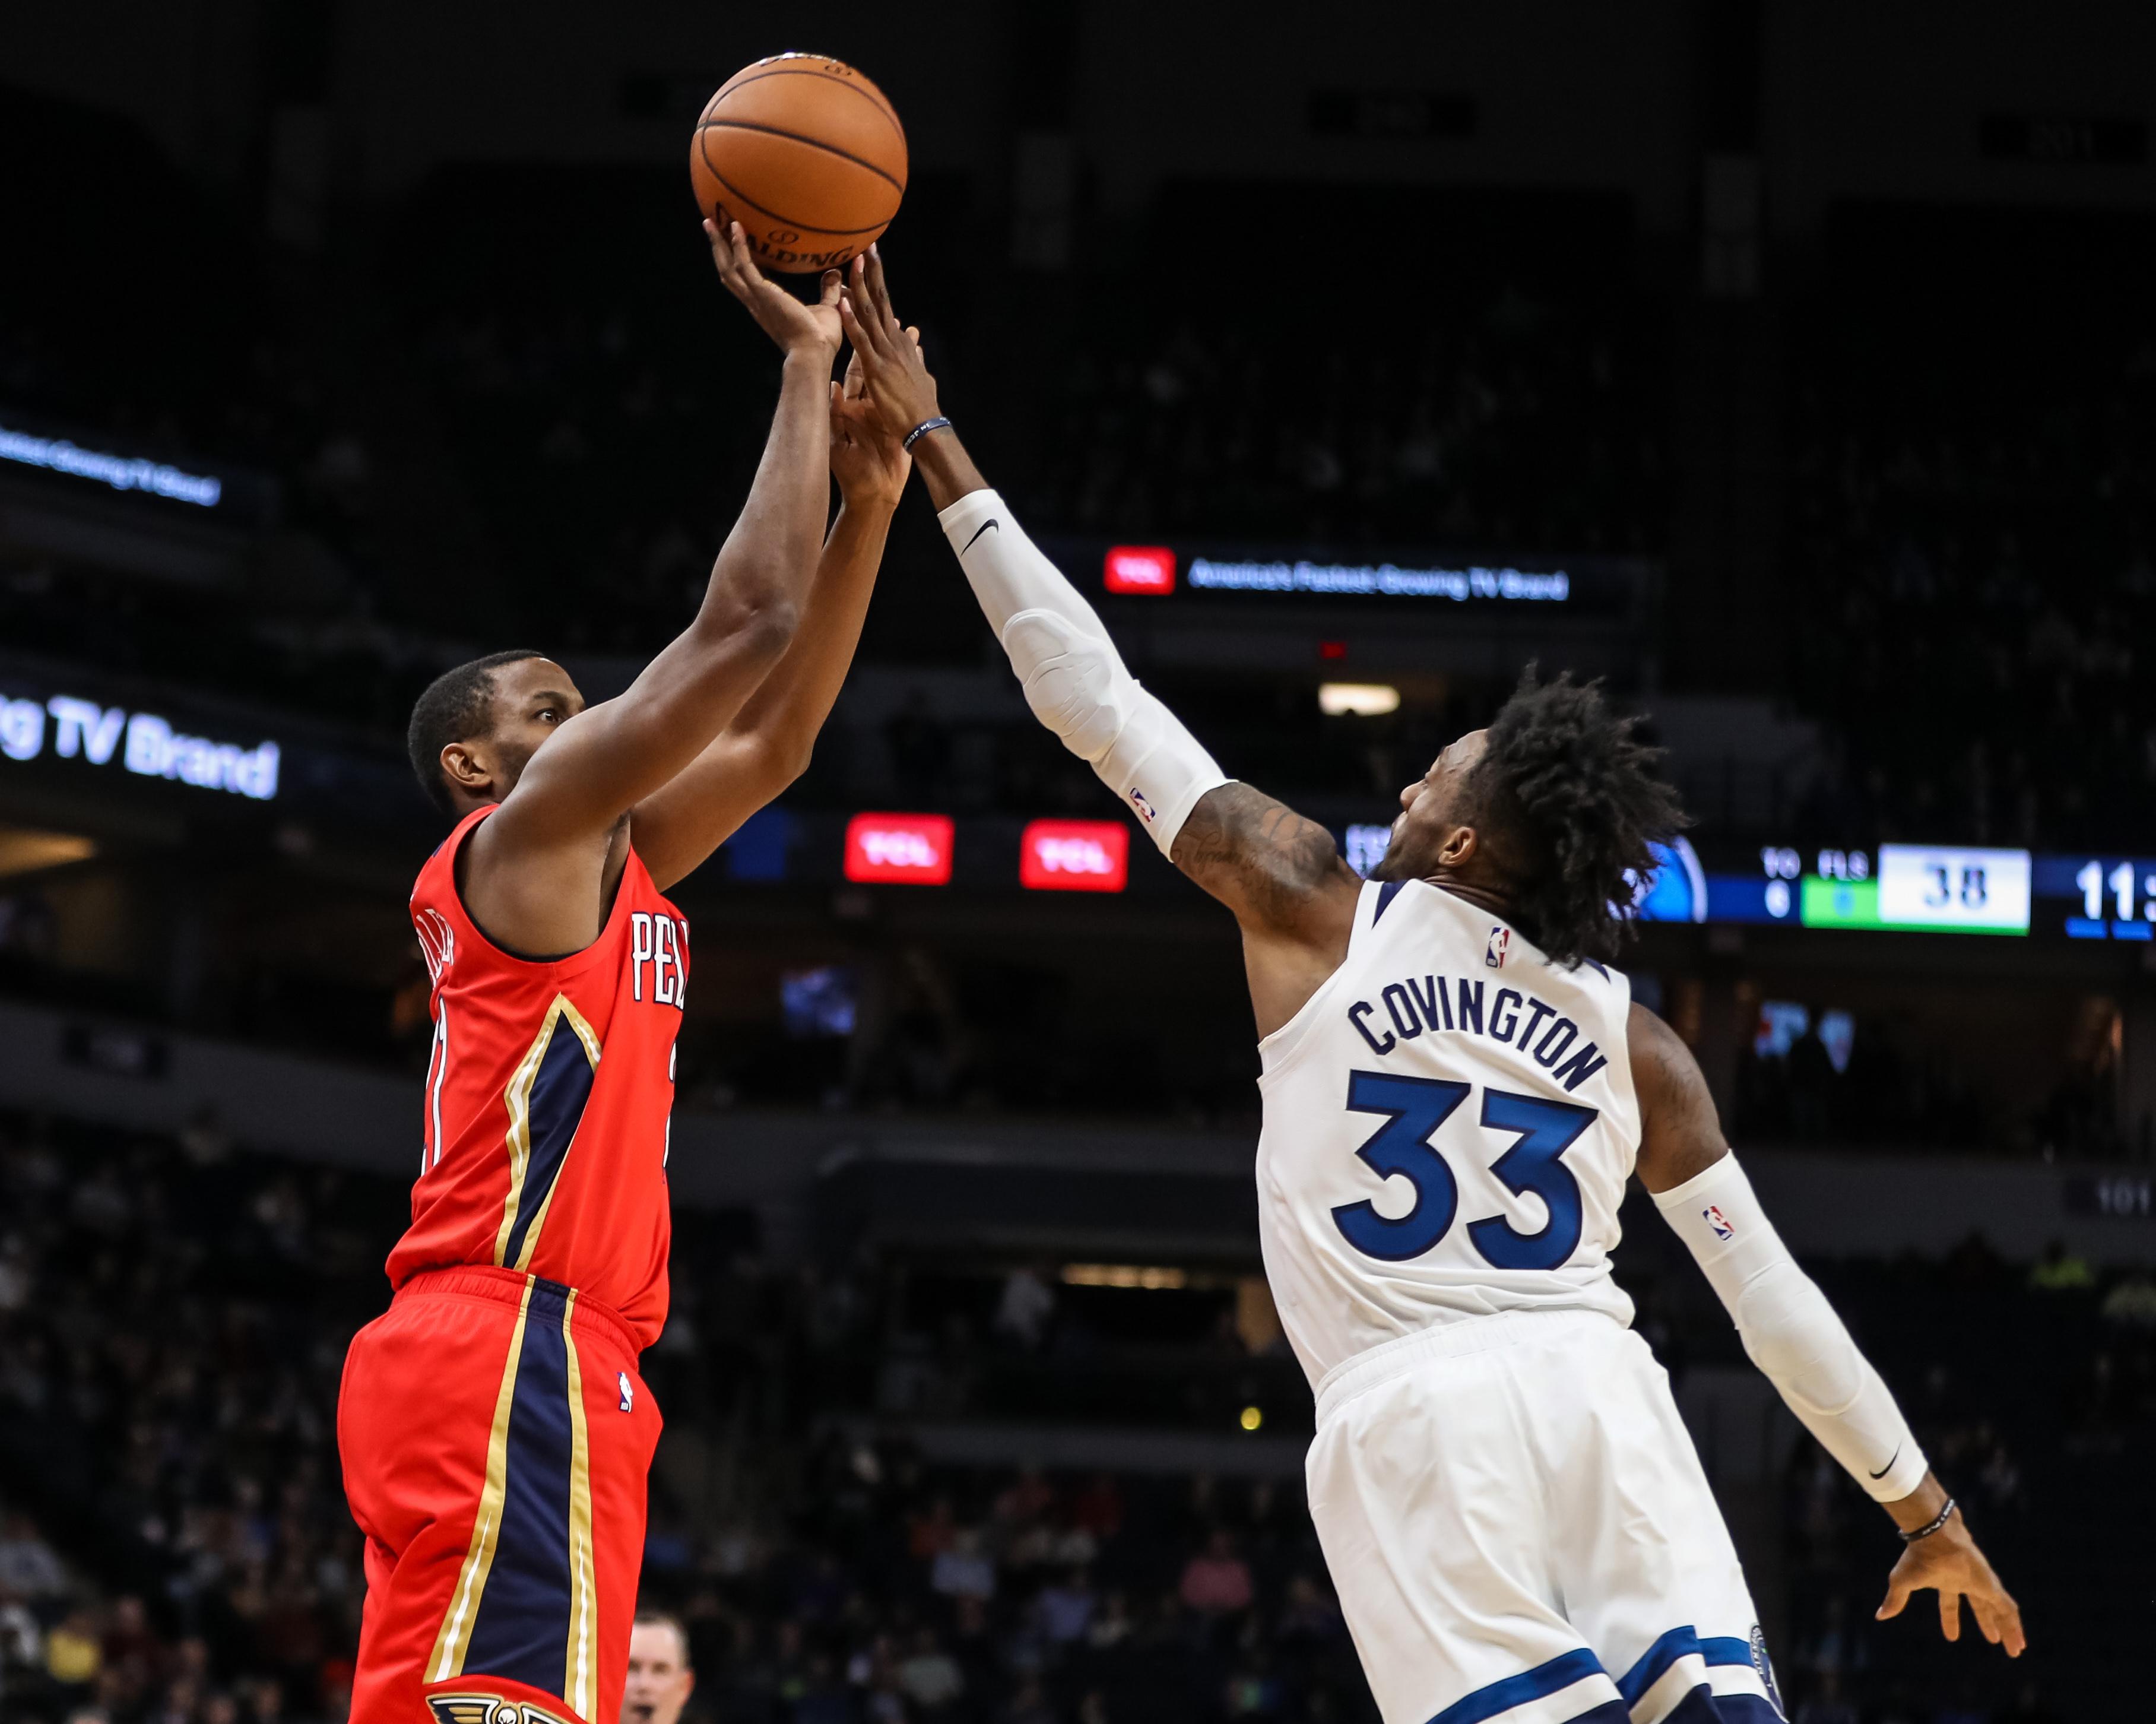 Pelicans vs Timberwolves